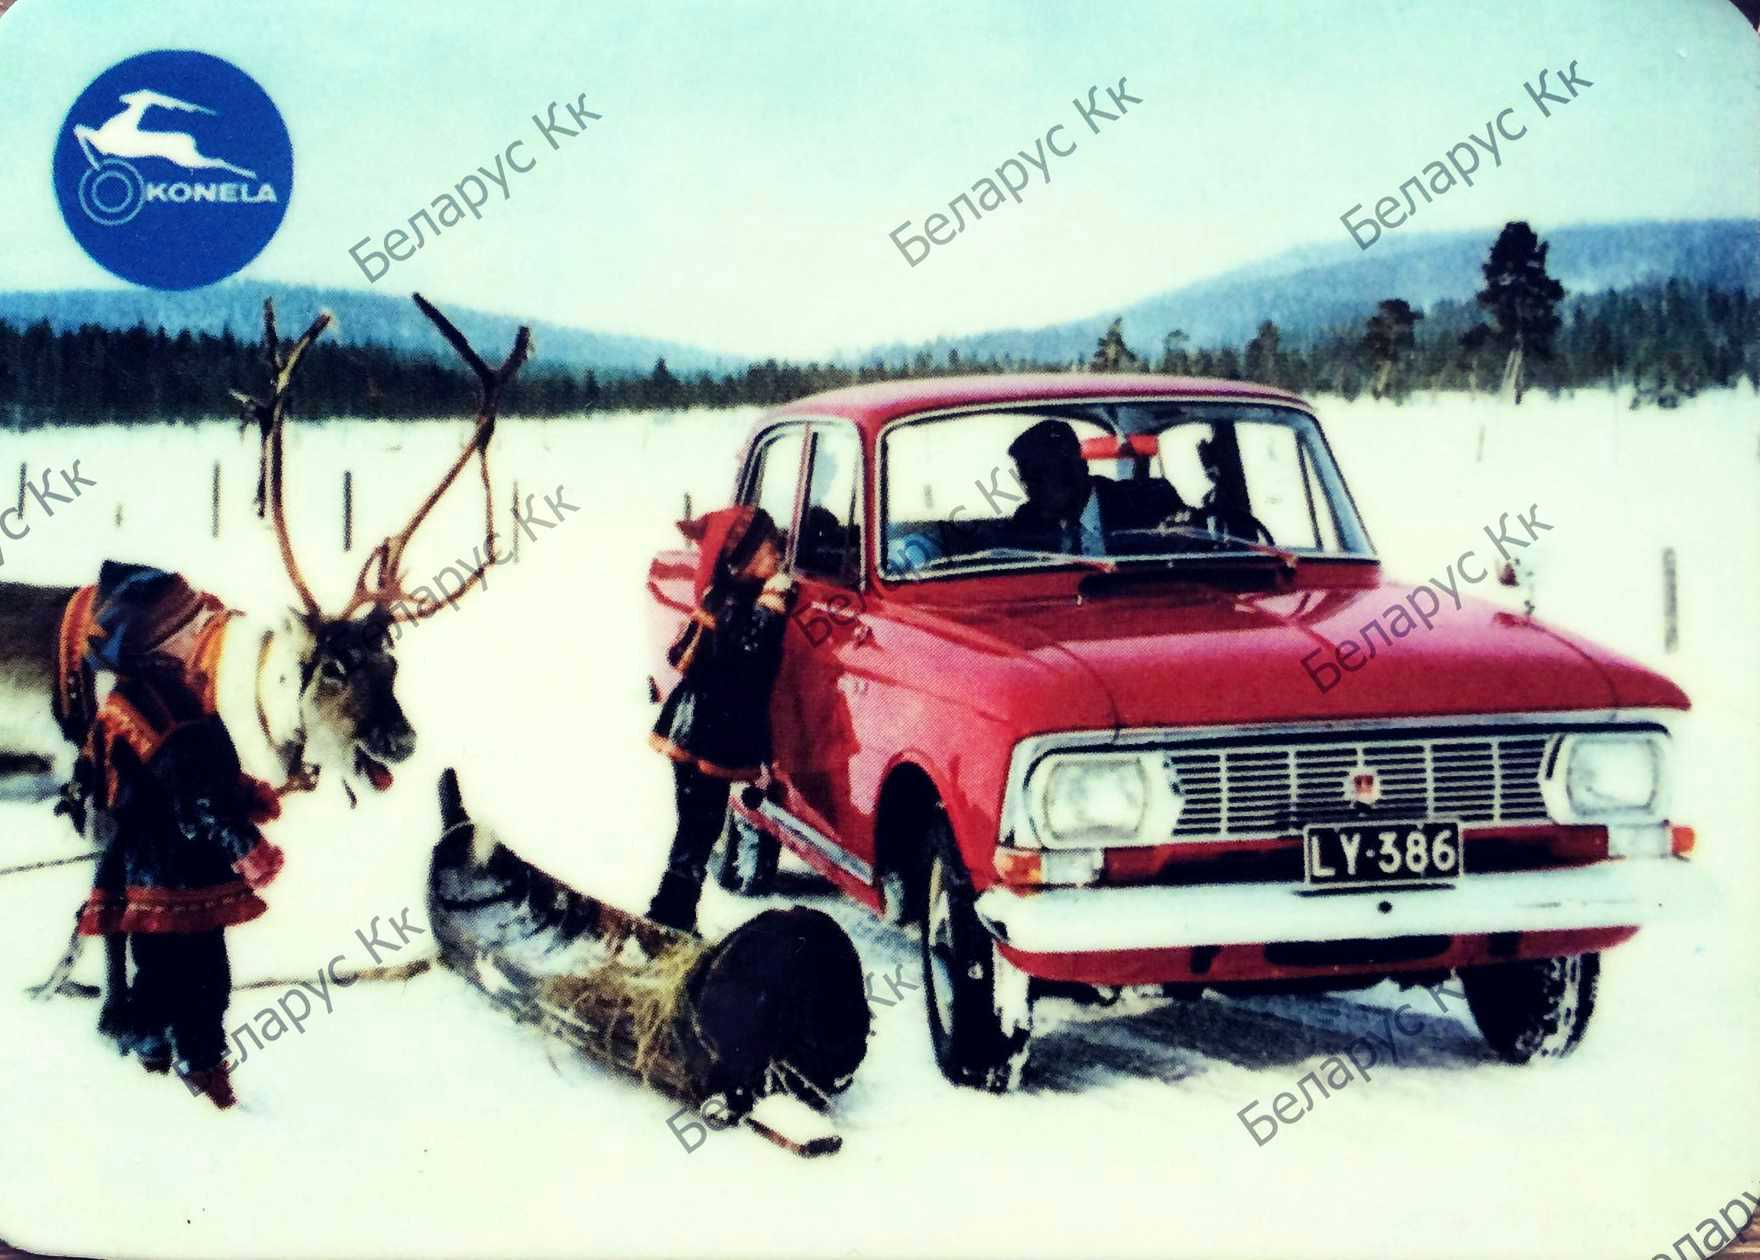 календарь автоэкспорт конела